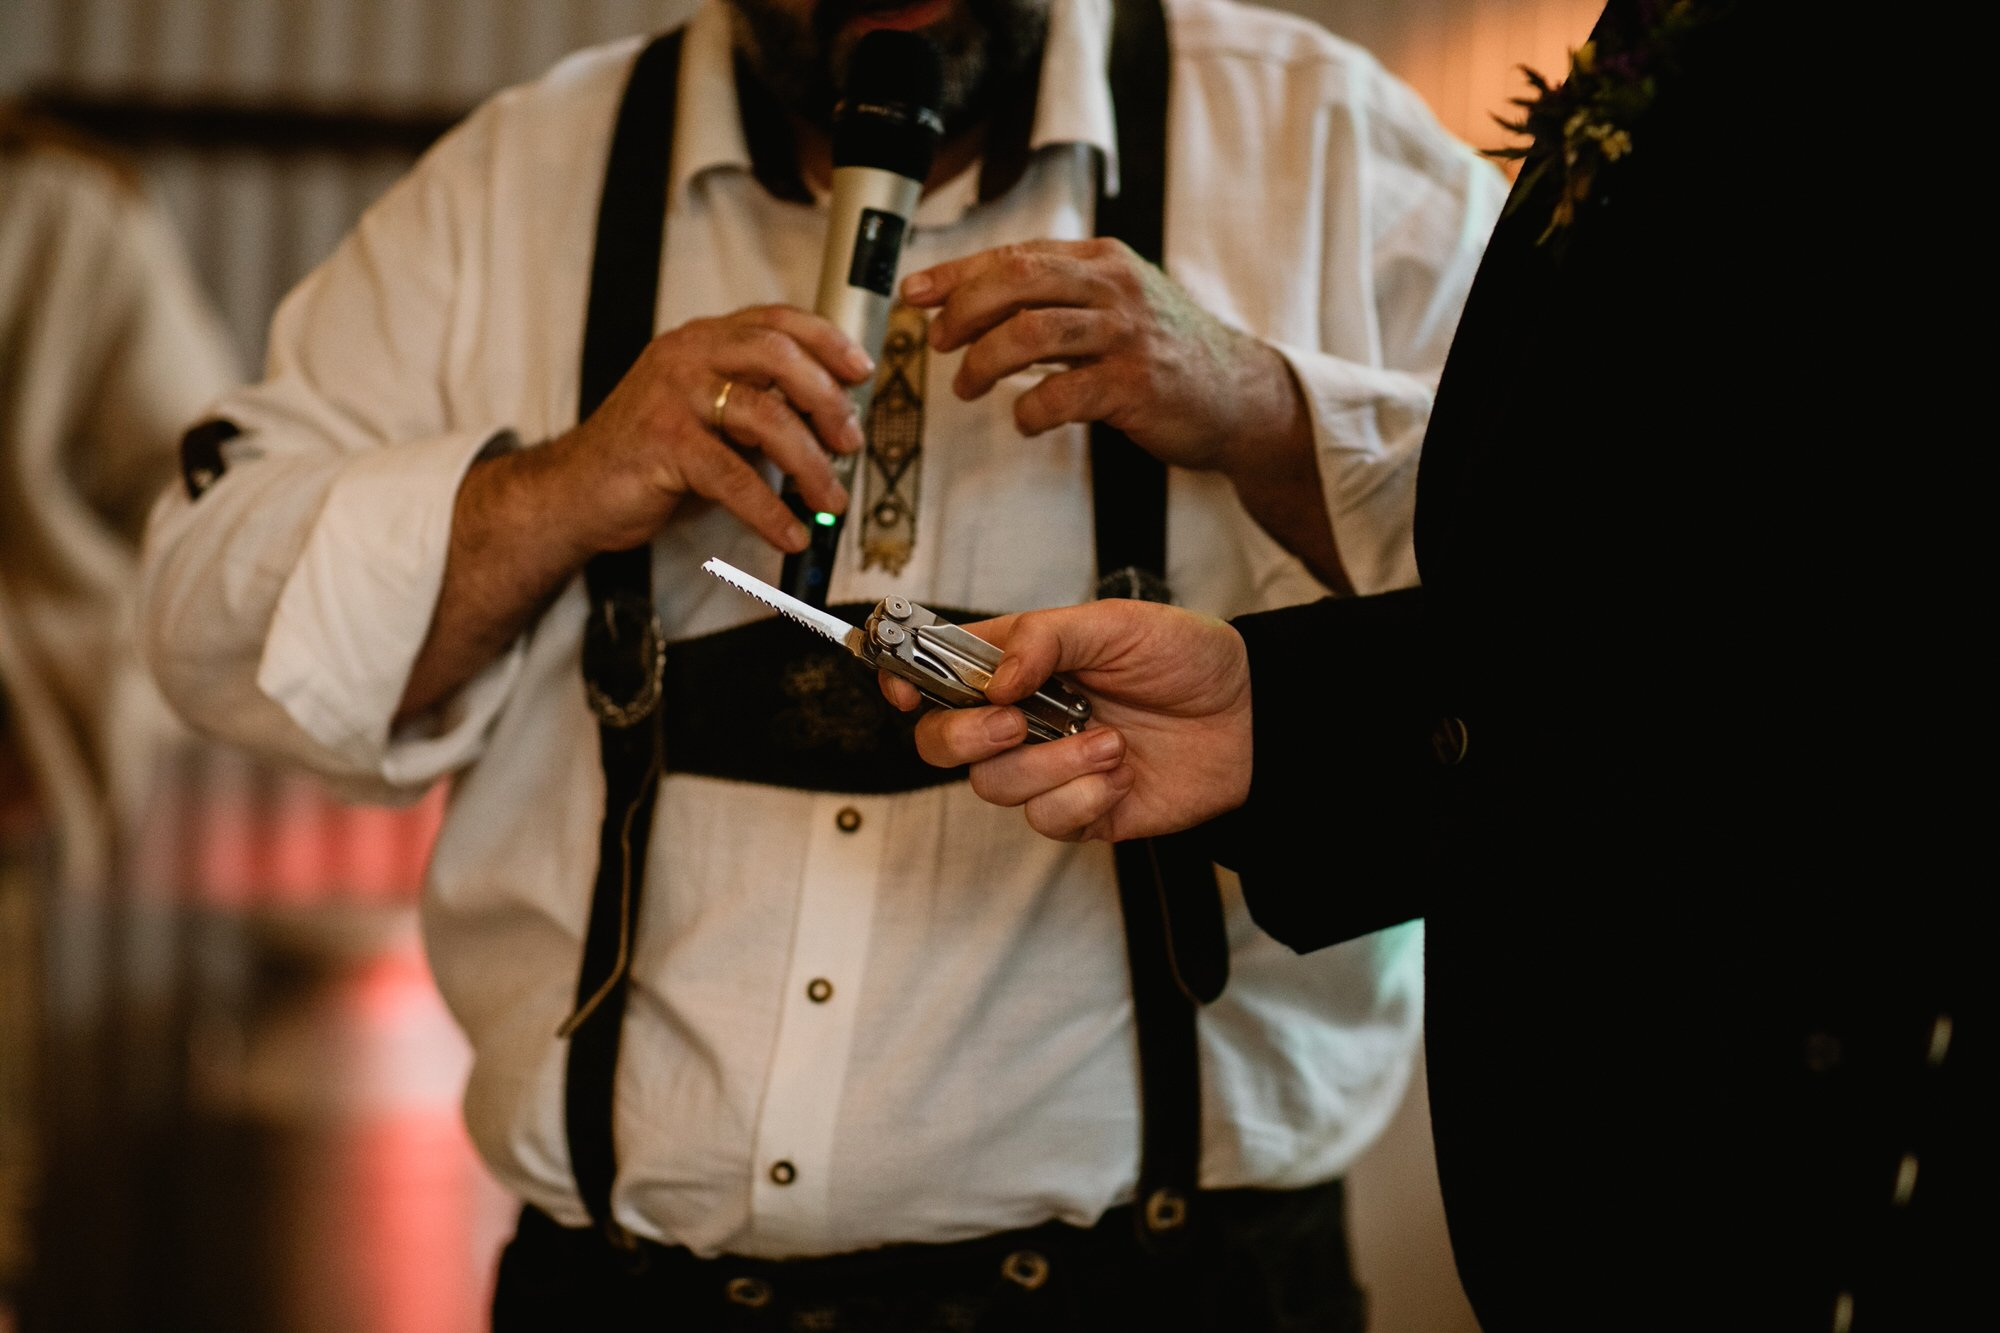 054 TIN SHED KNOCKRAICH WEDDING AUSTRIAN SCOTTISH ZOE ALEXANDRA PHOTOGRAPHY